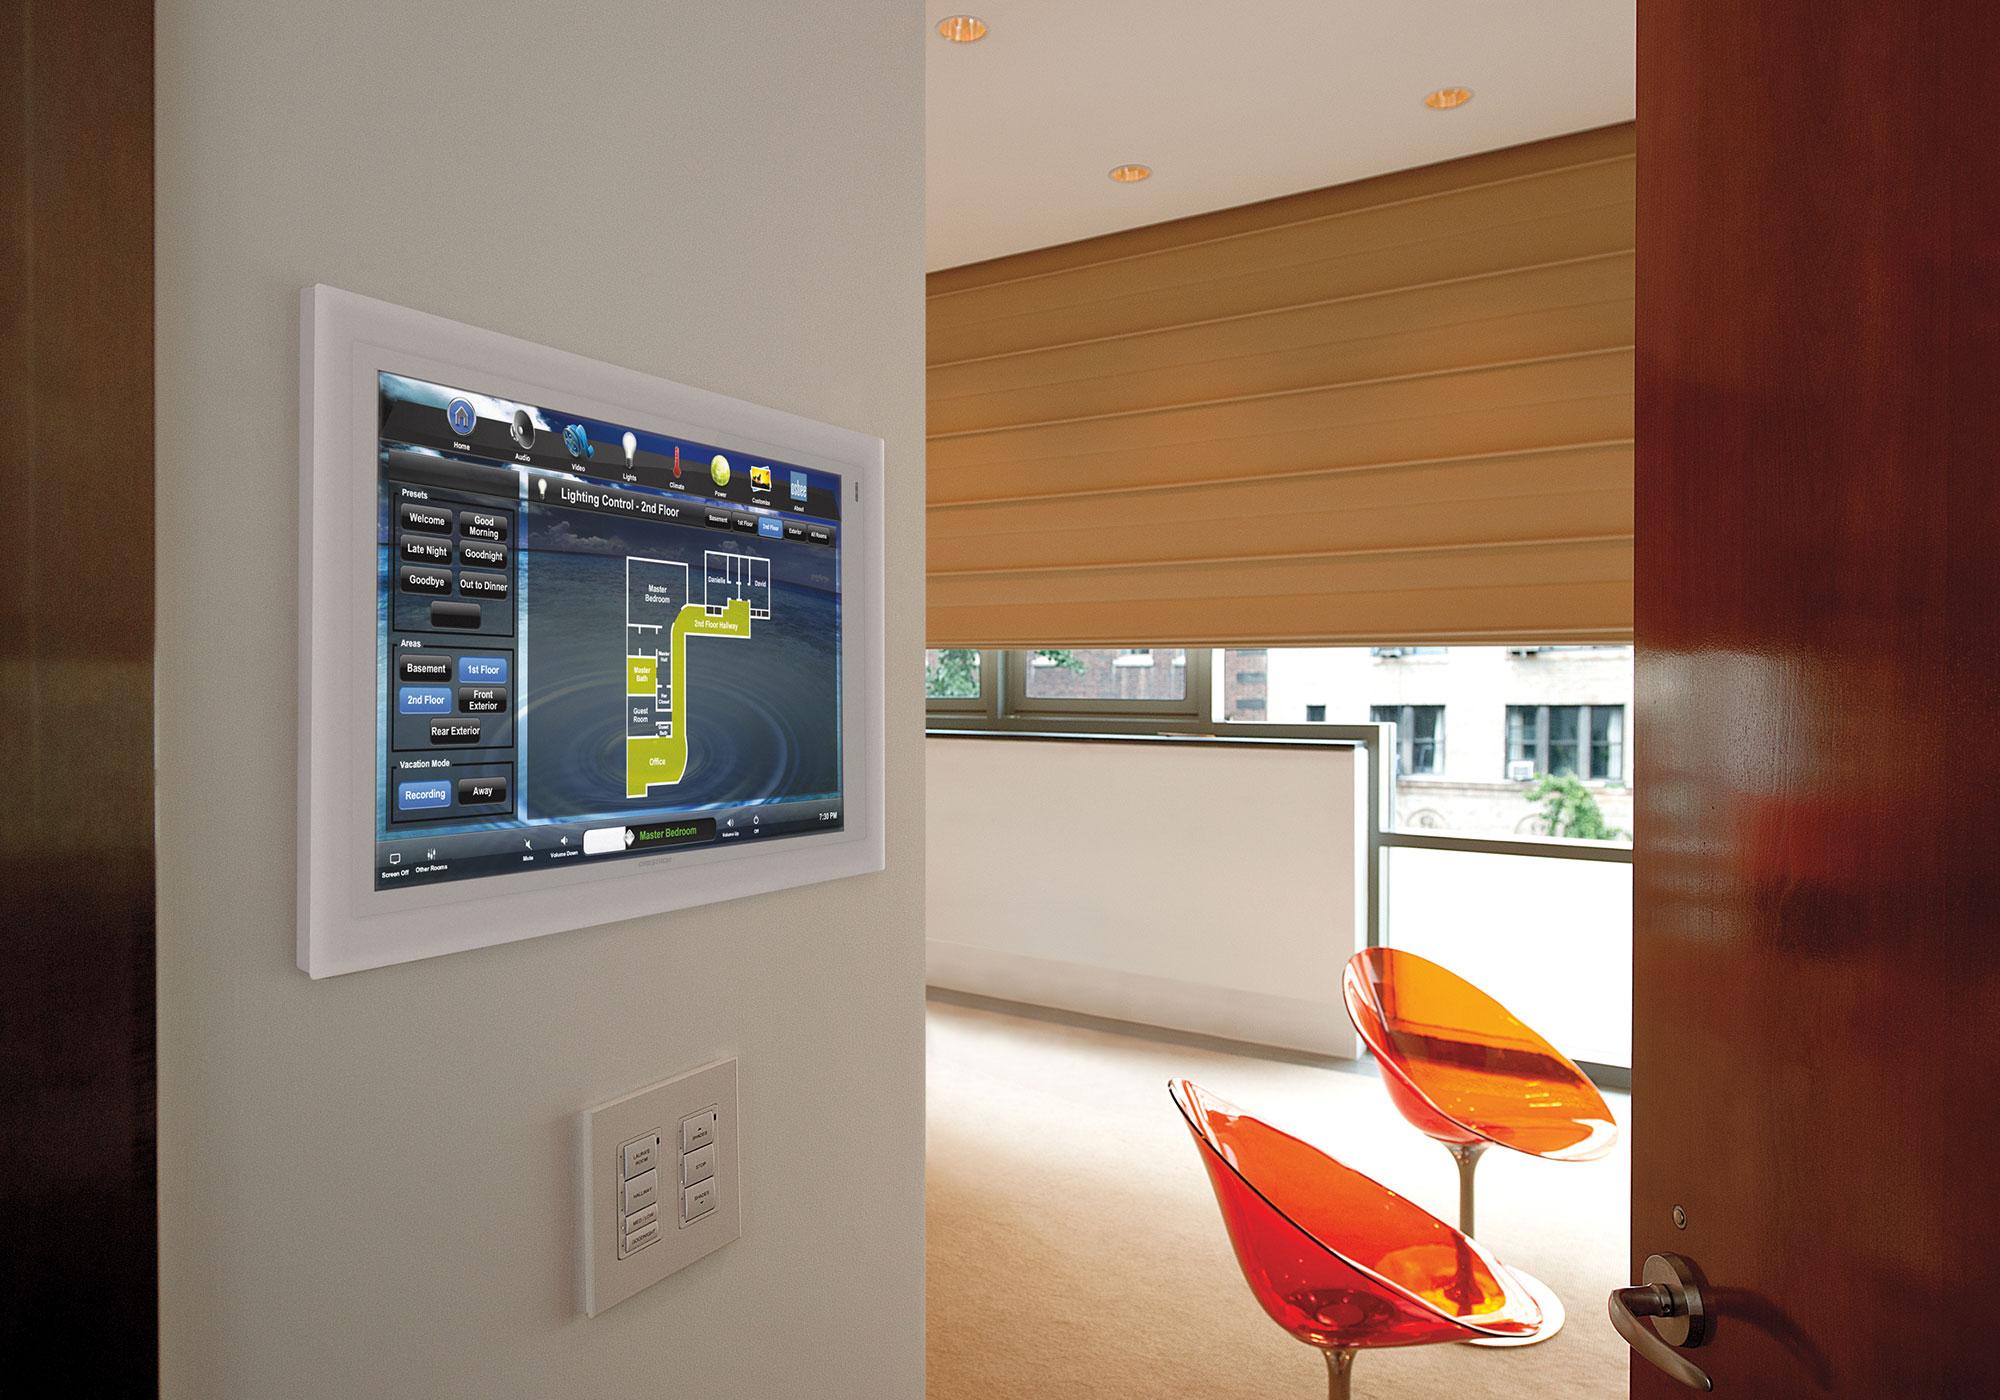 Bedroom, touchscreen, wall-mount touchscreen, lighting screen, keypad, presets